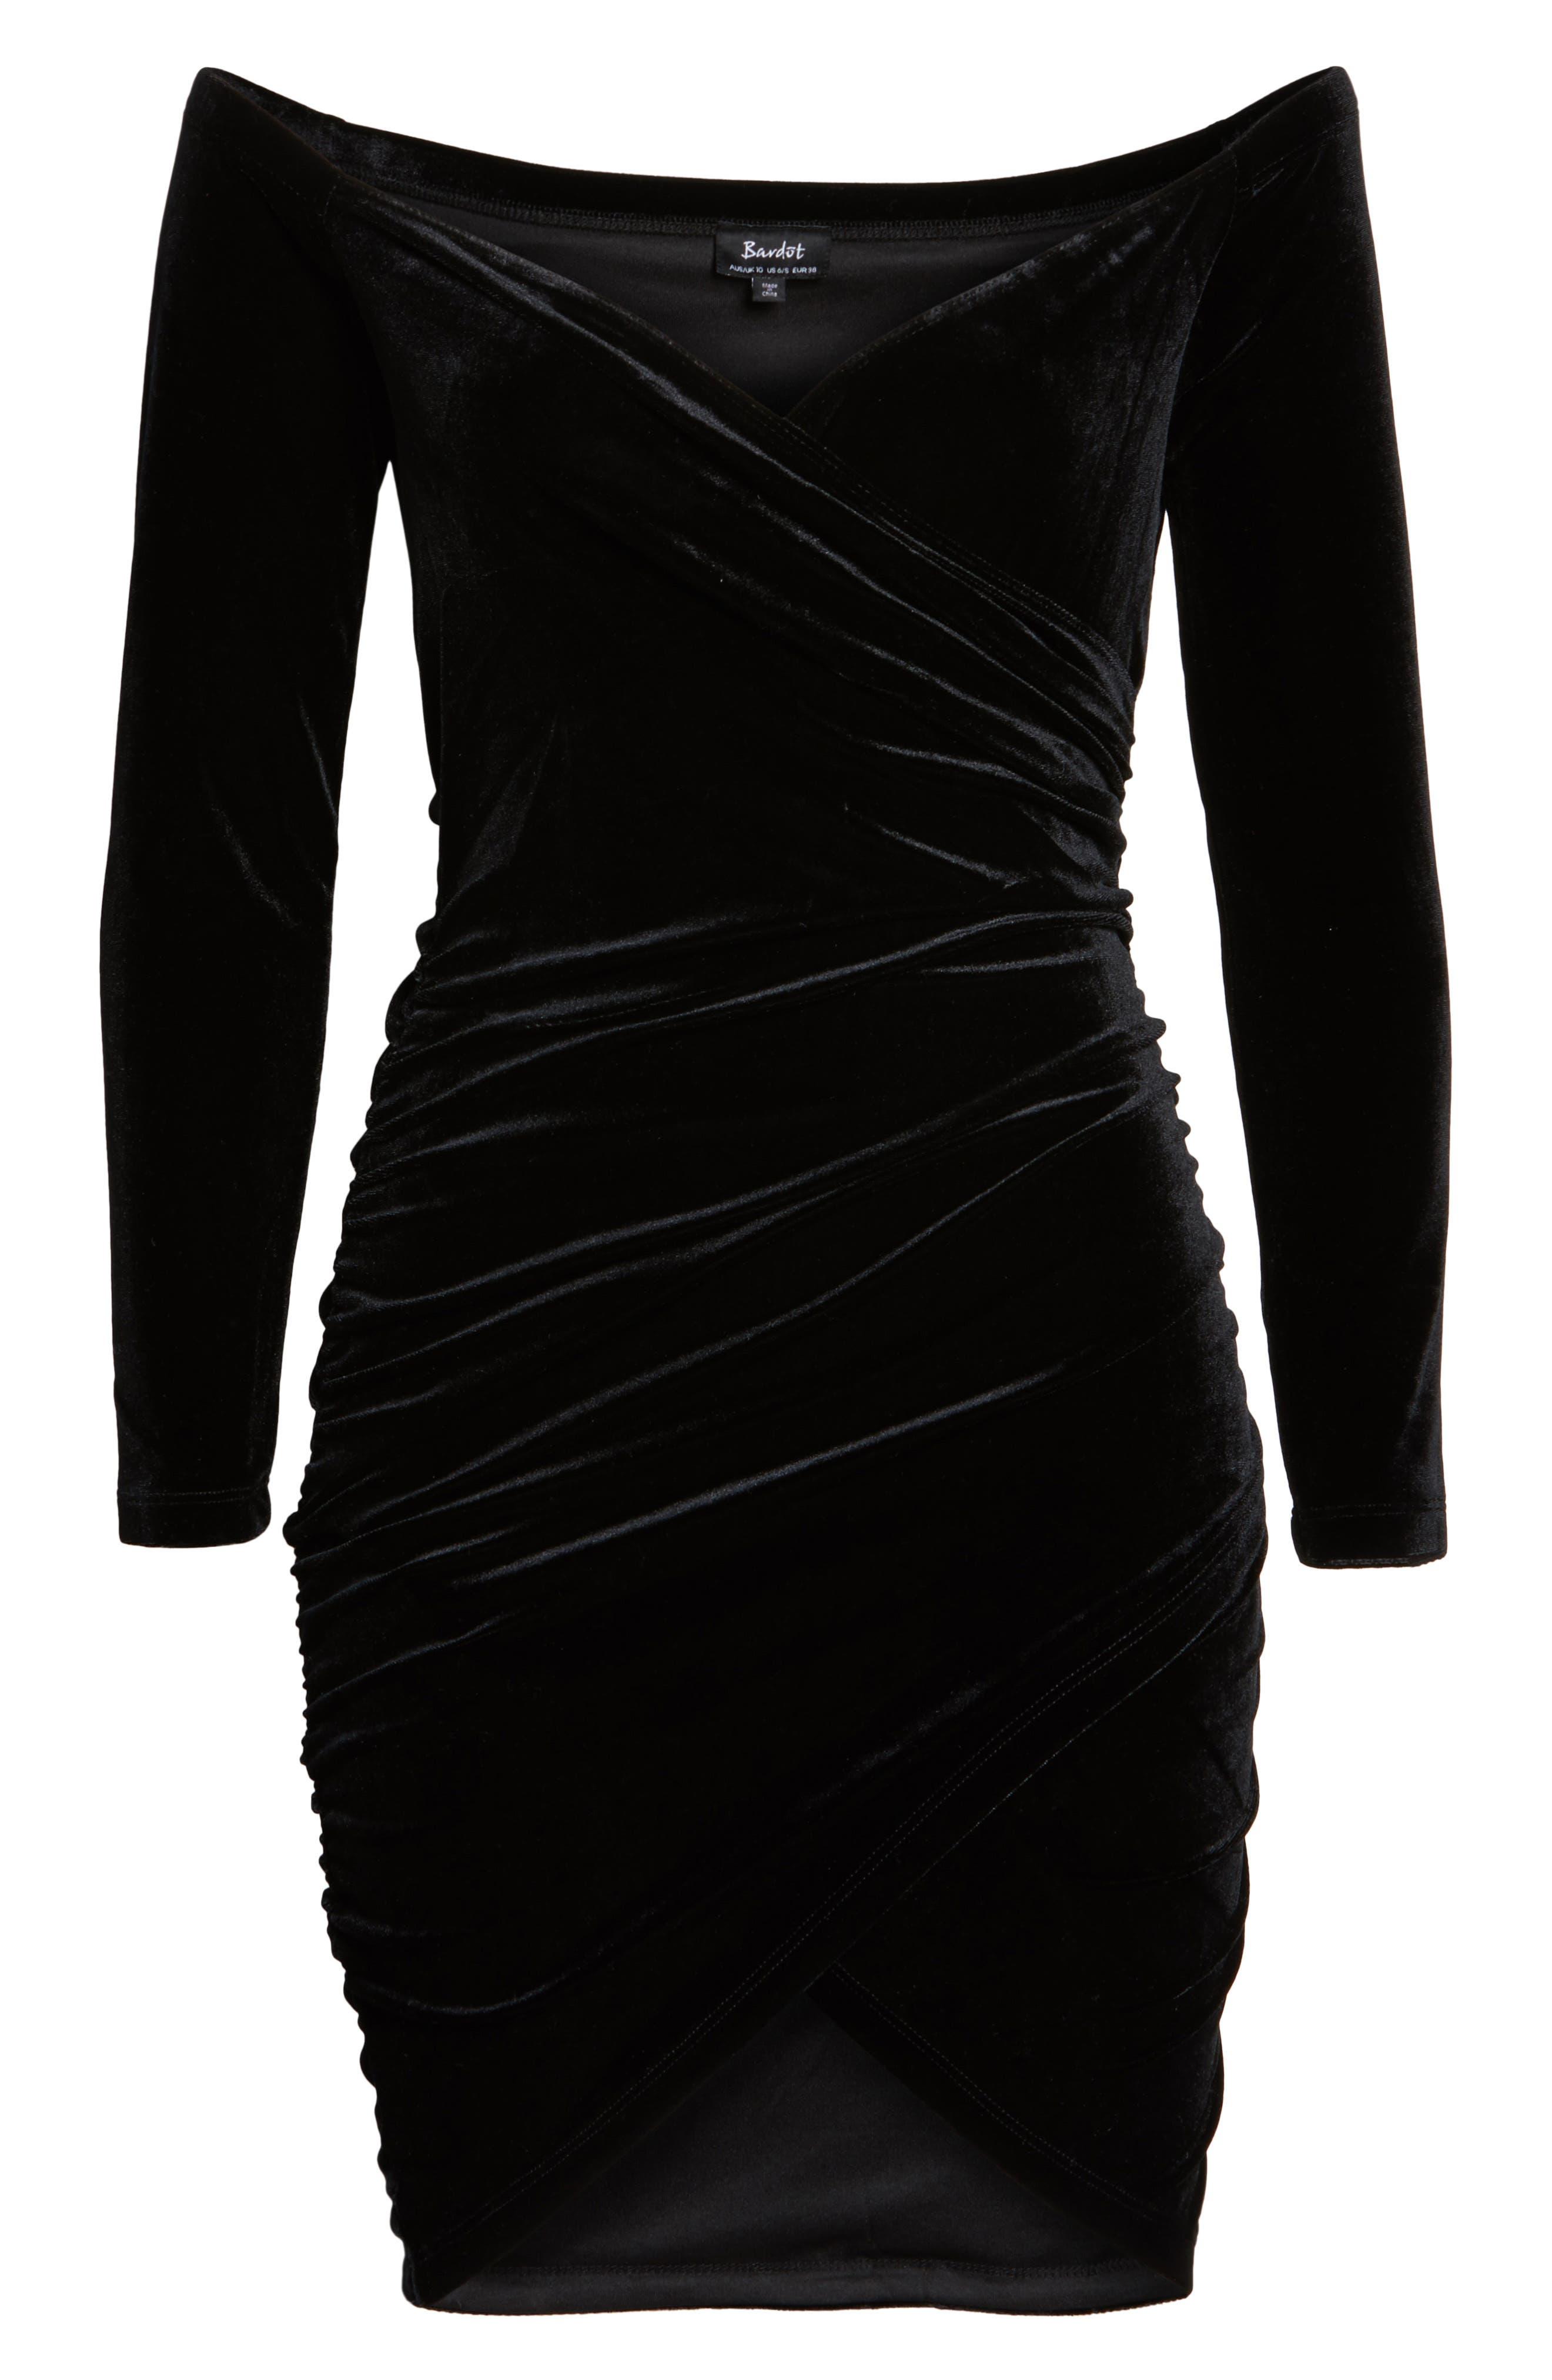 Alex Off the Shoulder Velvet Body-Con Dress,                             Alternate thumbnail 6, color,                             001